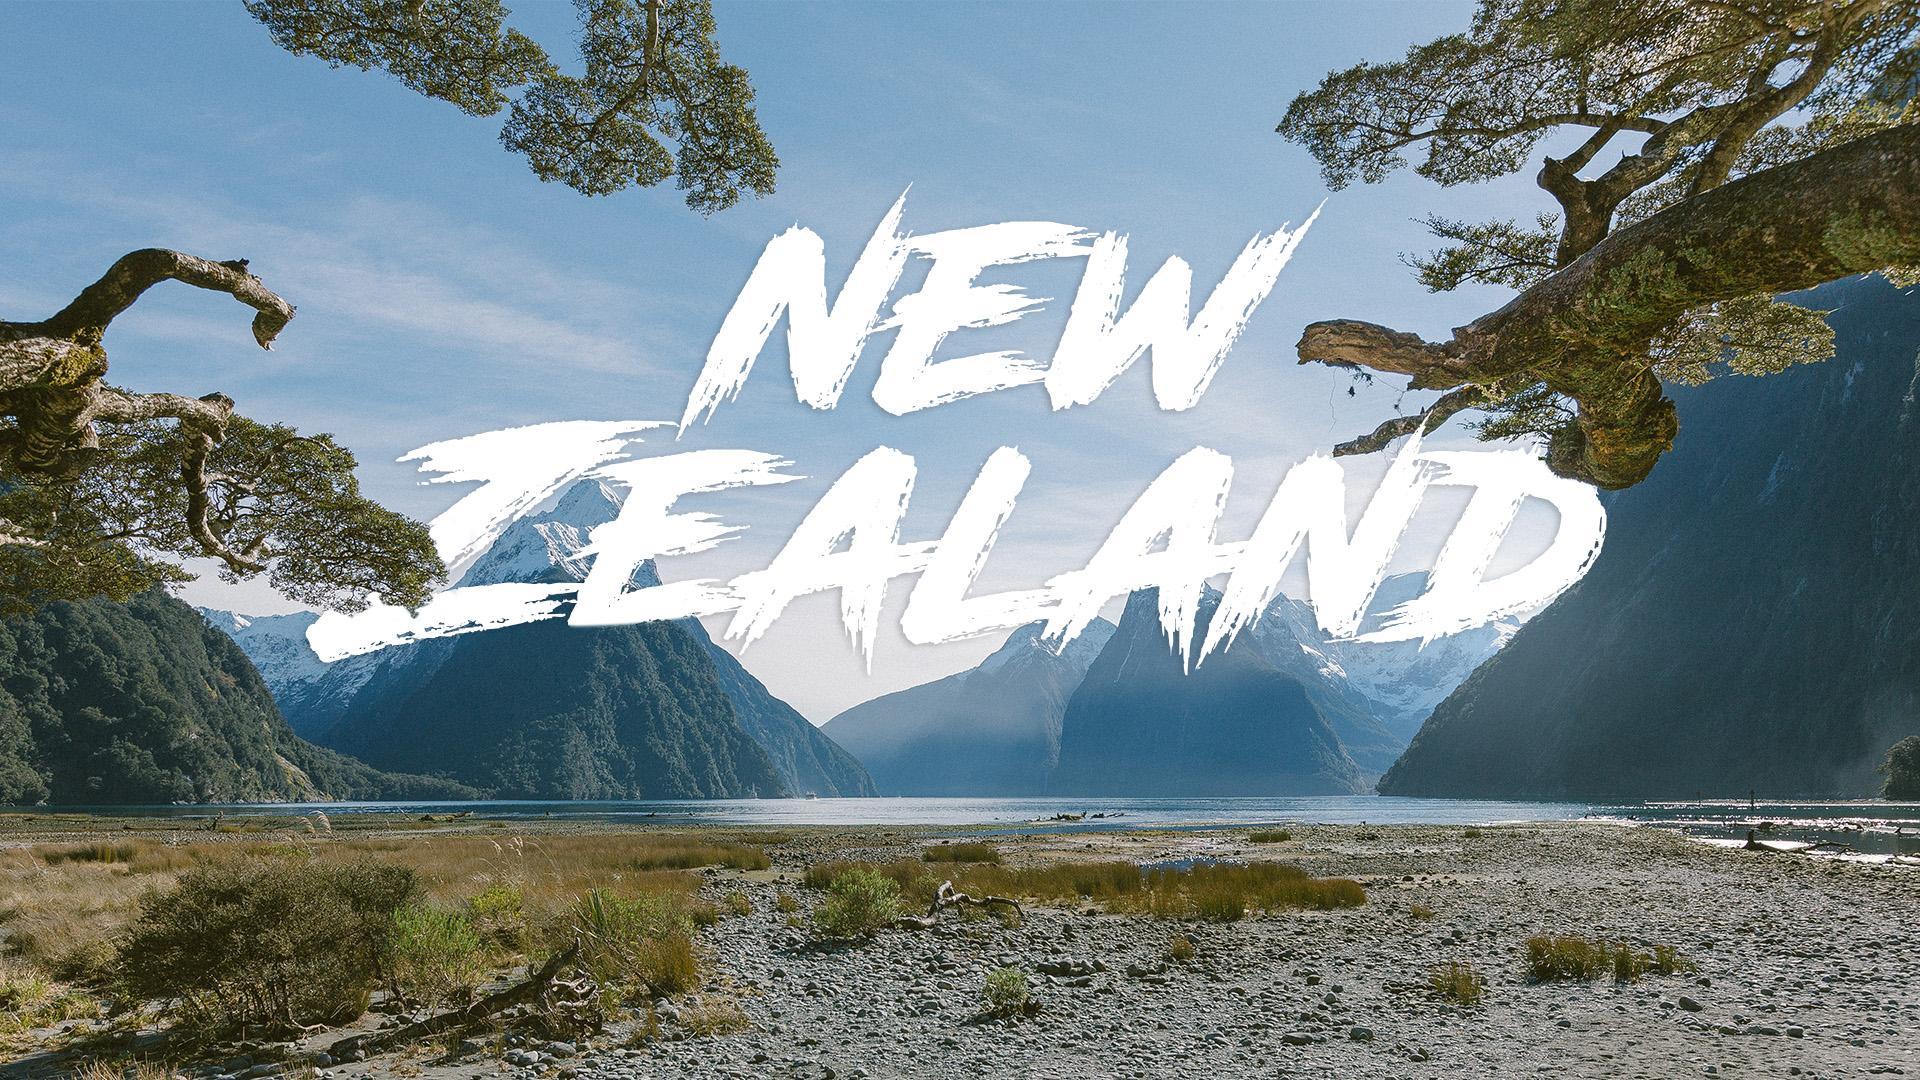 NZ Thumbnail (No Boarder).jpg